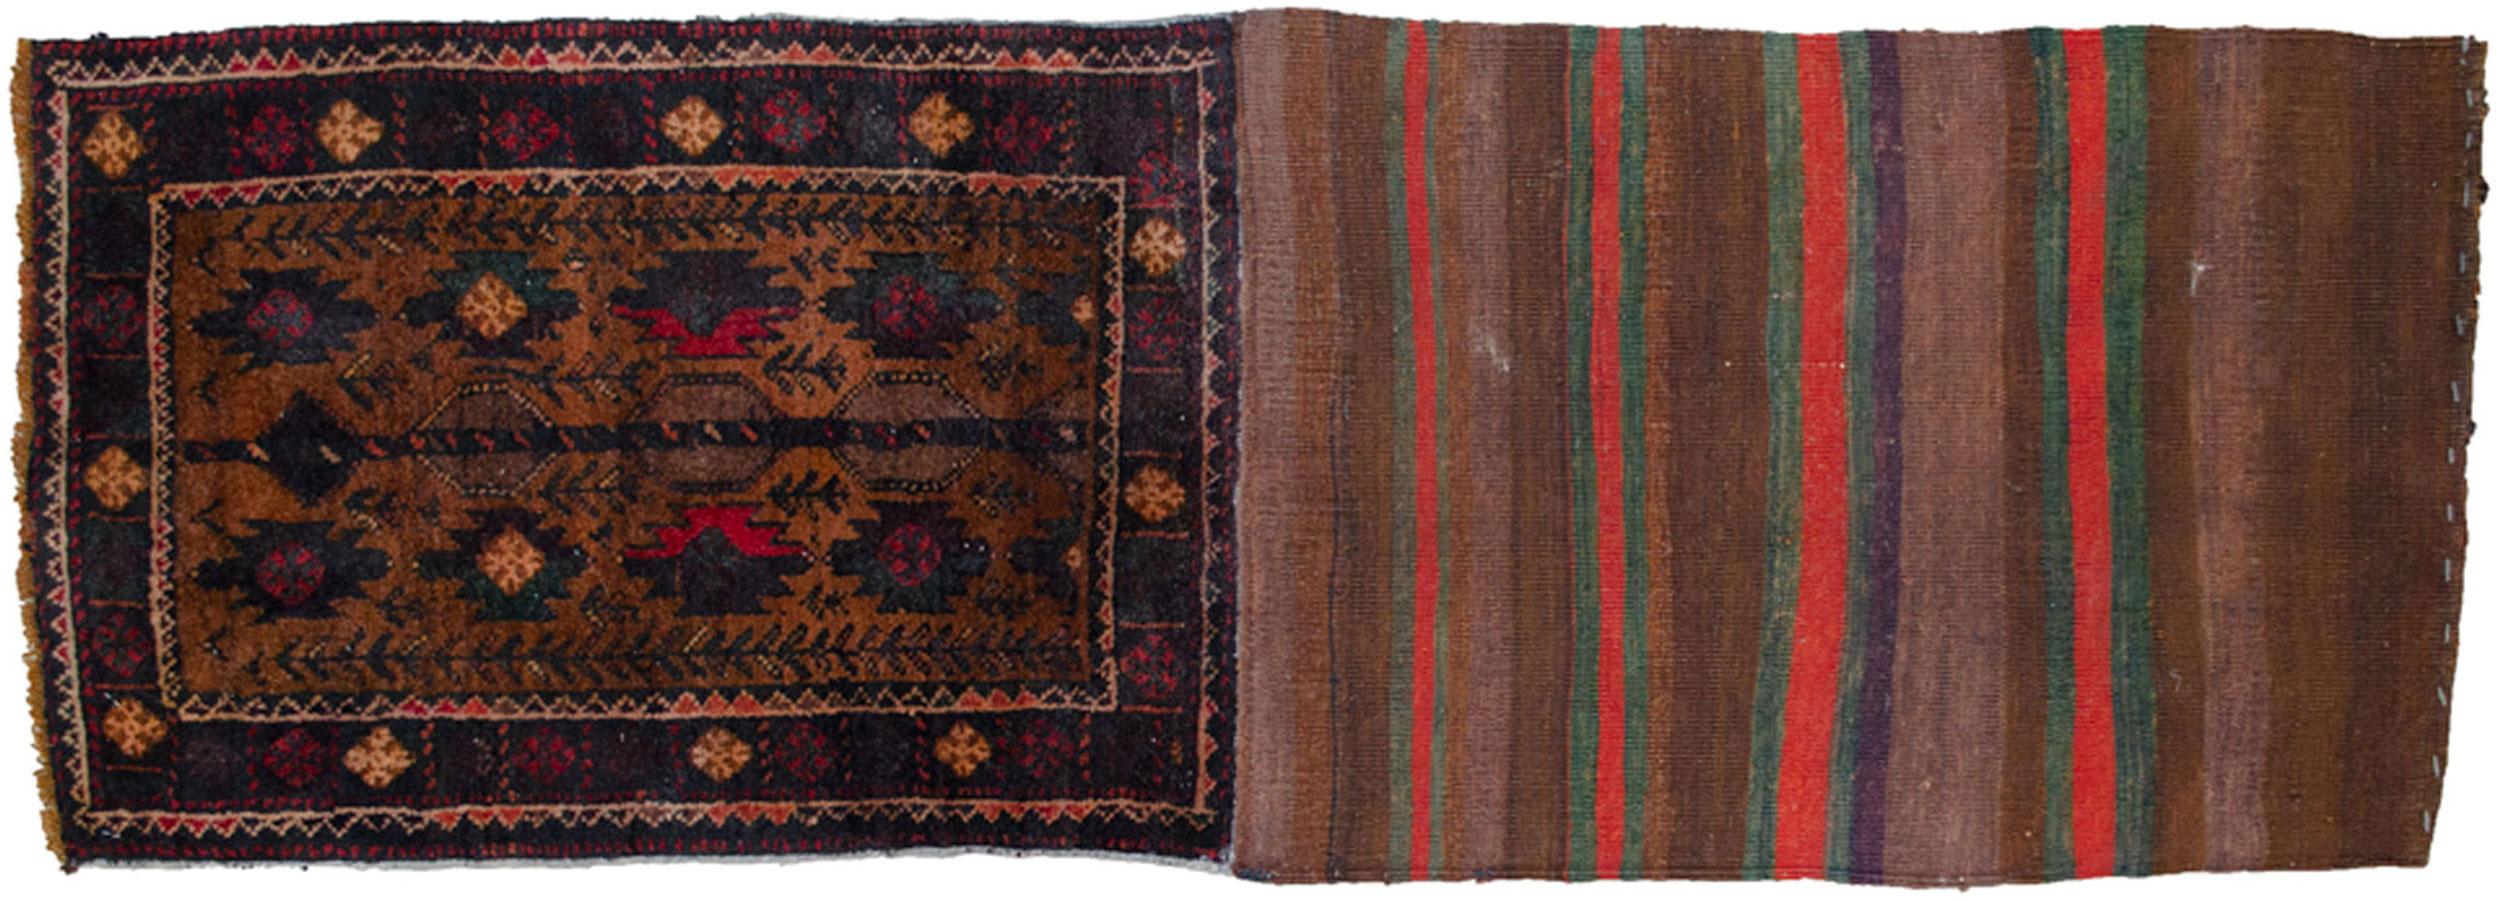 Antique Baluch Bag 145x48cm